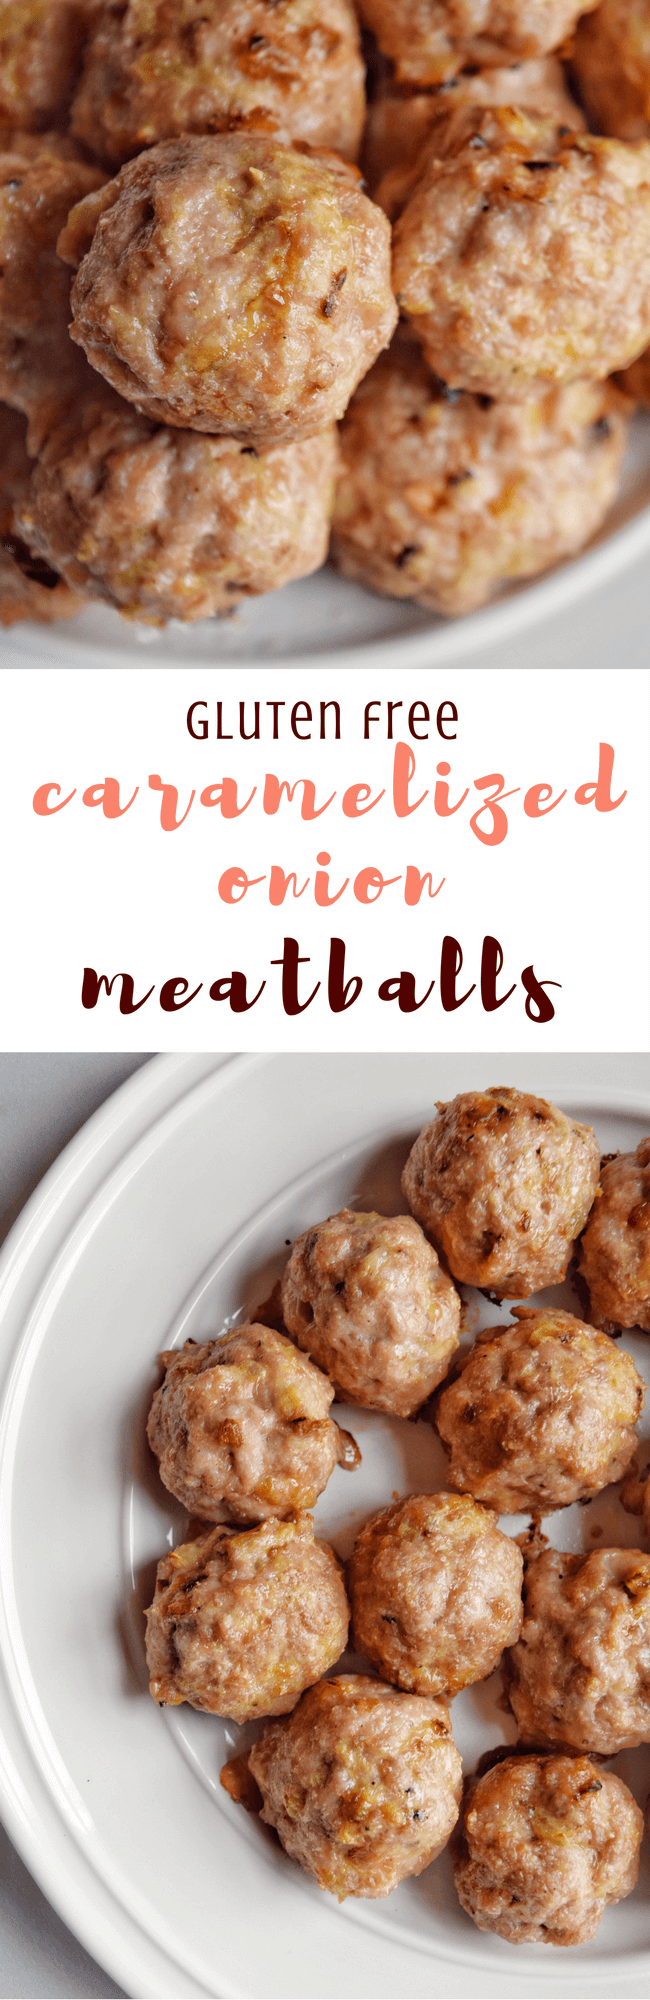 Gluten Free Caramelized Onion Meatballs (Paleo, Sugar Free) | Personally Paleo